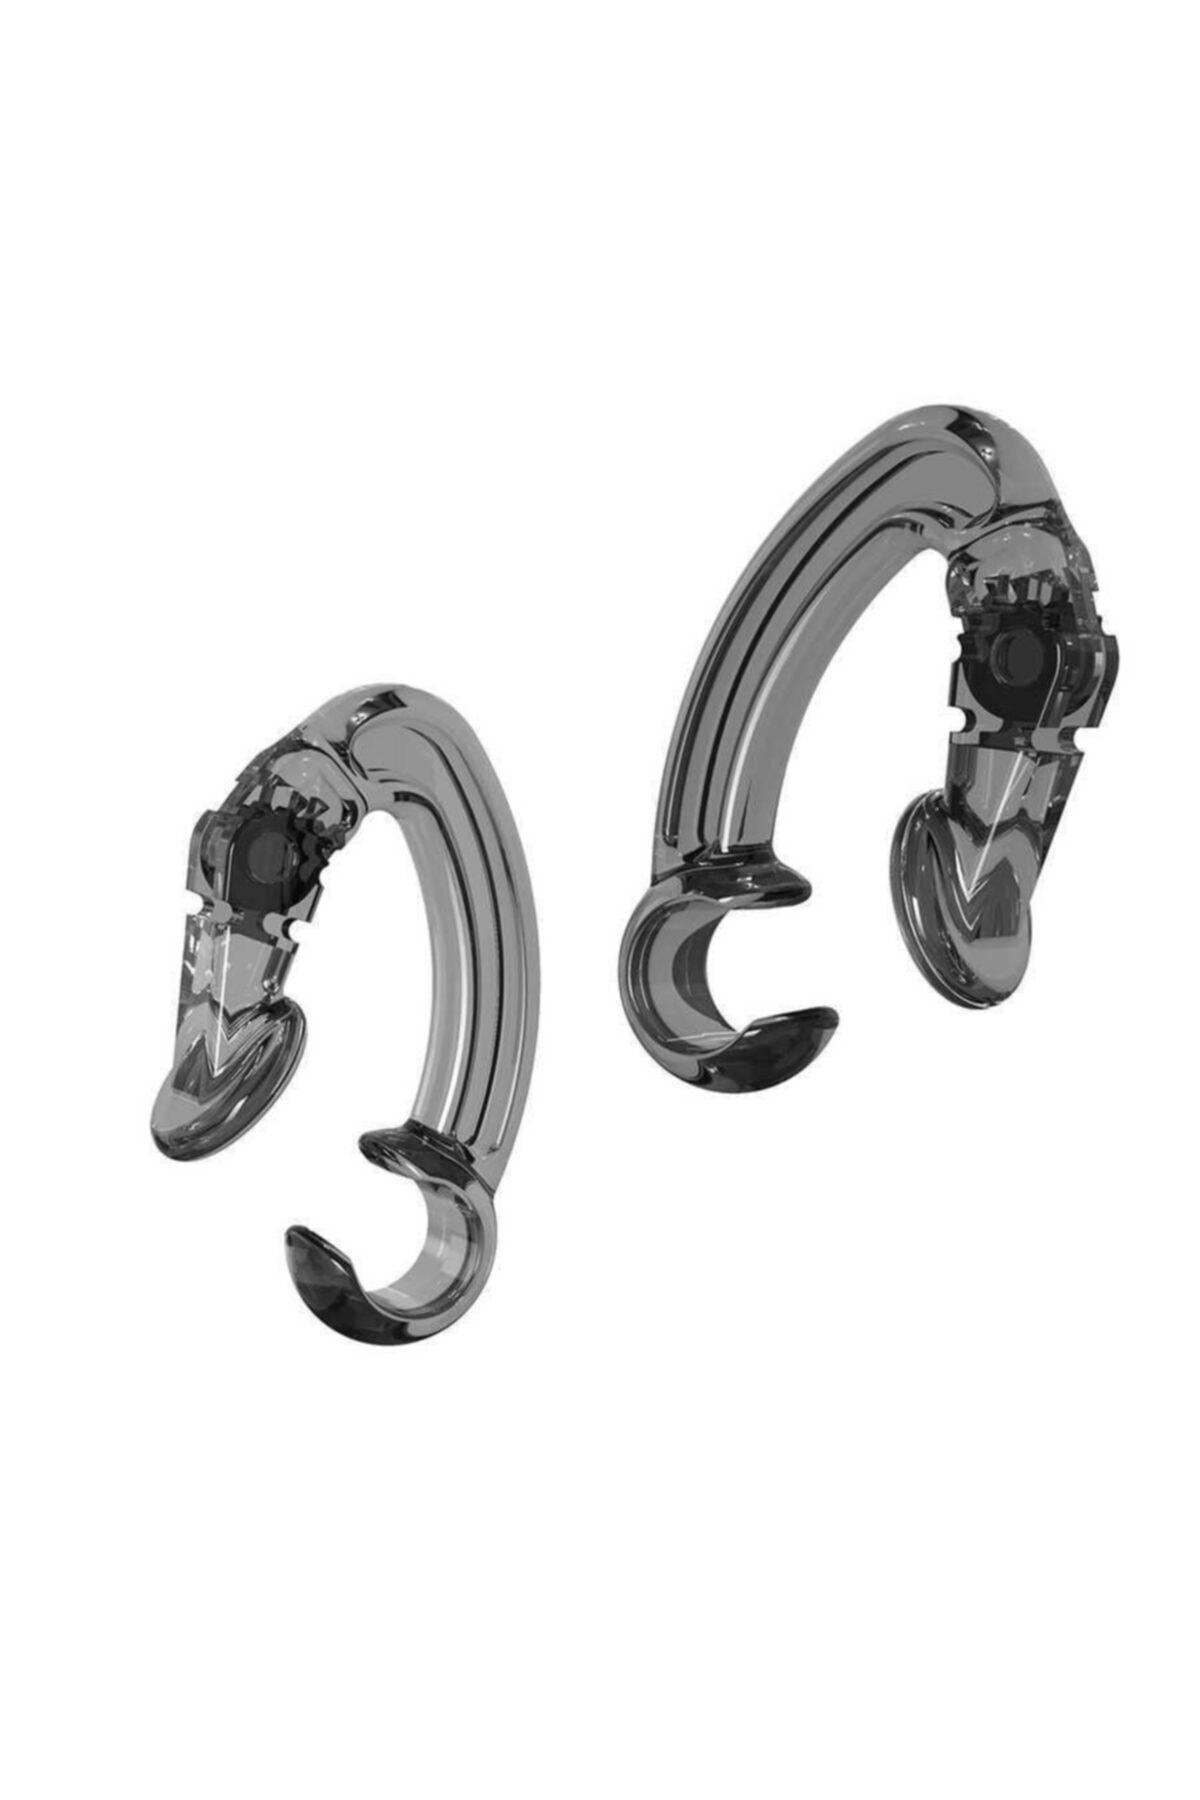 zore Apple Airpods Pro Earhook Kulaklık Tutucu Aparat 1